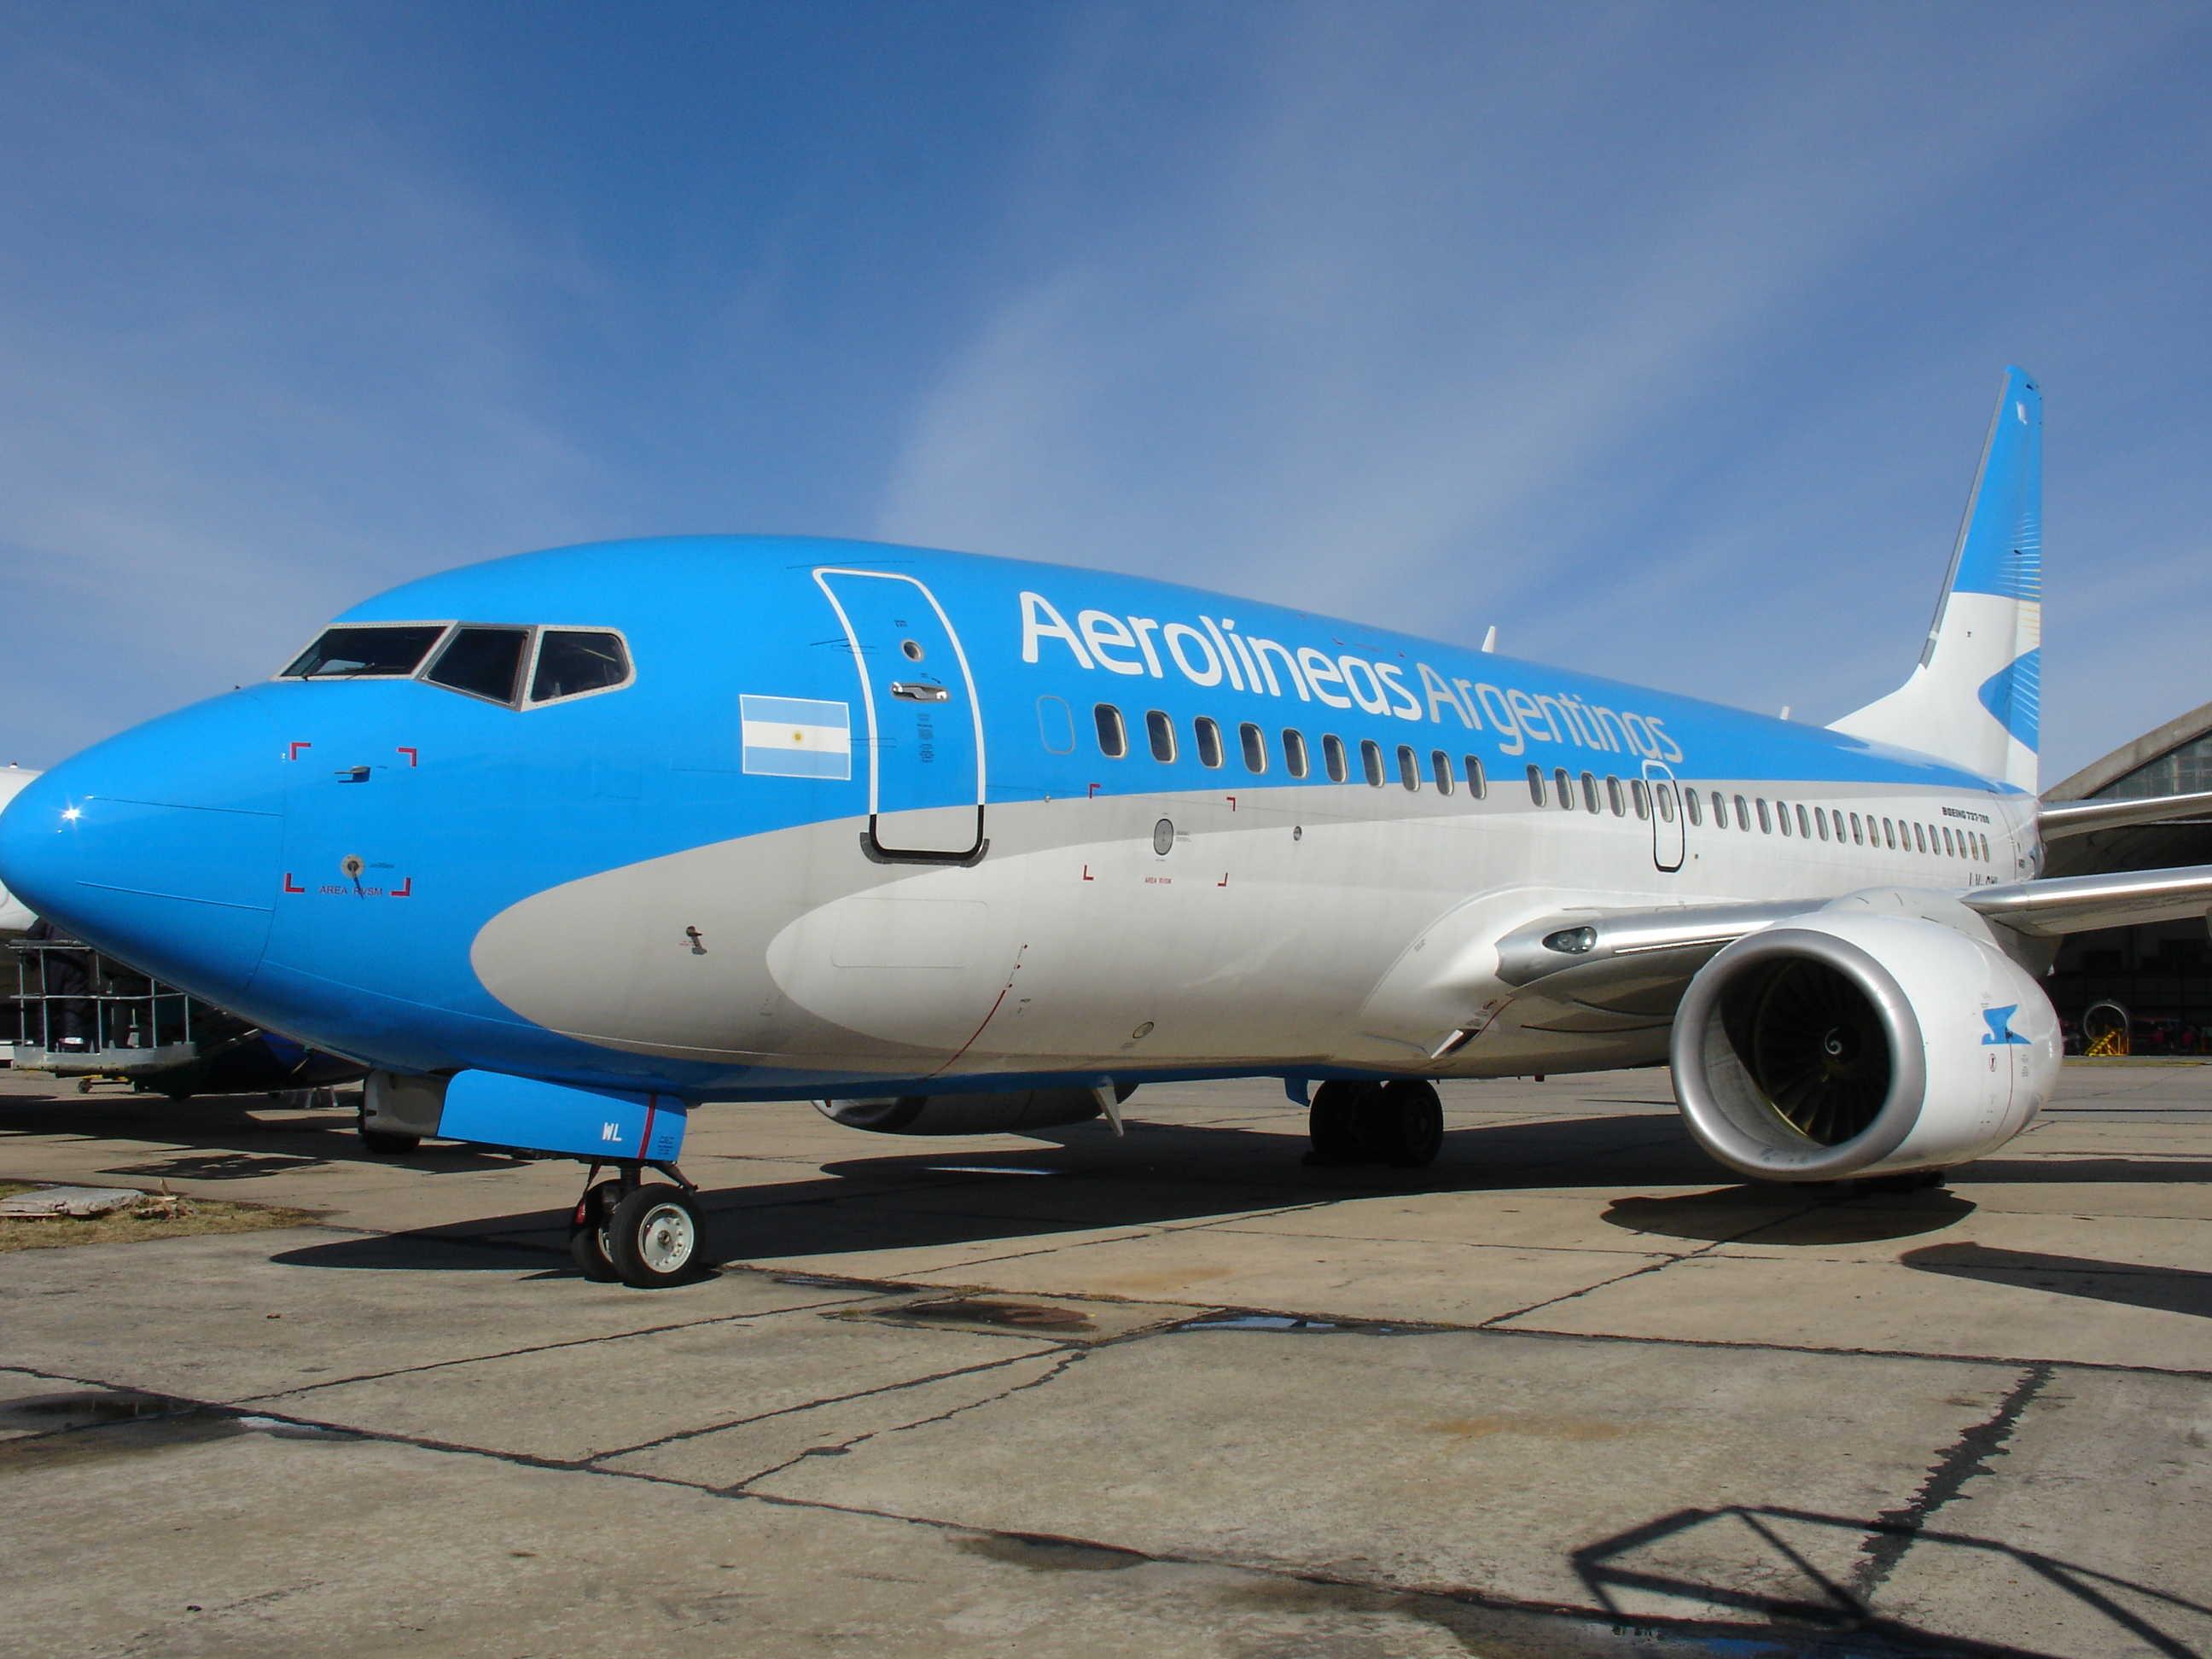 aerolineas-argentinas-2